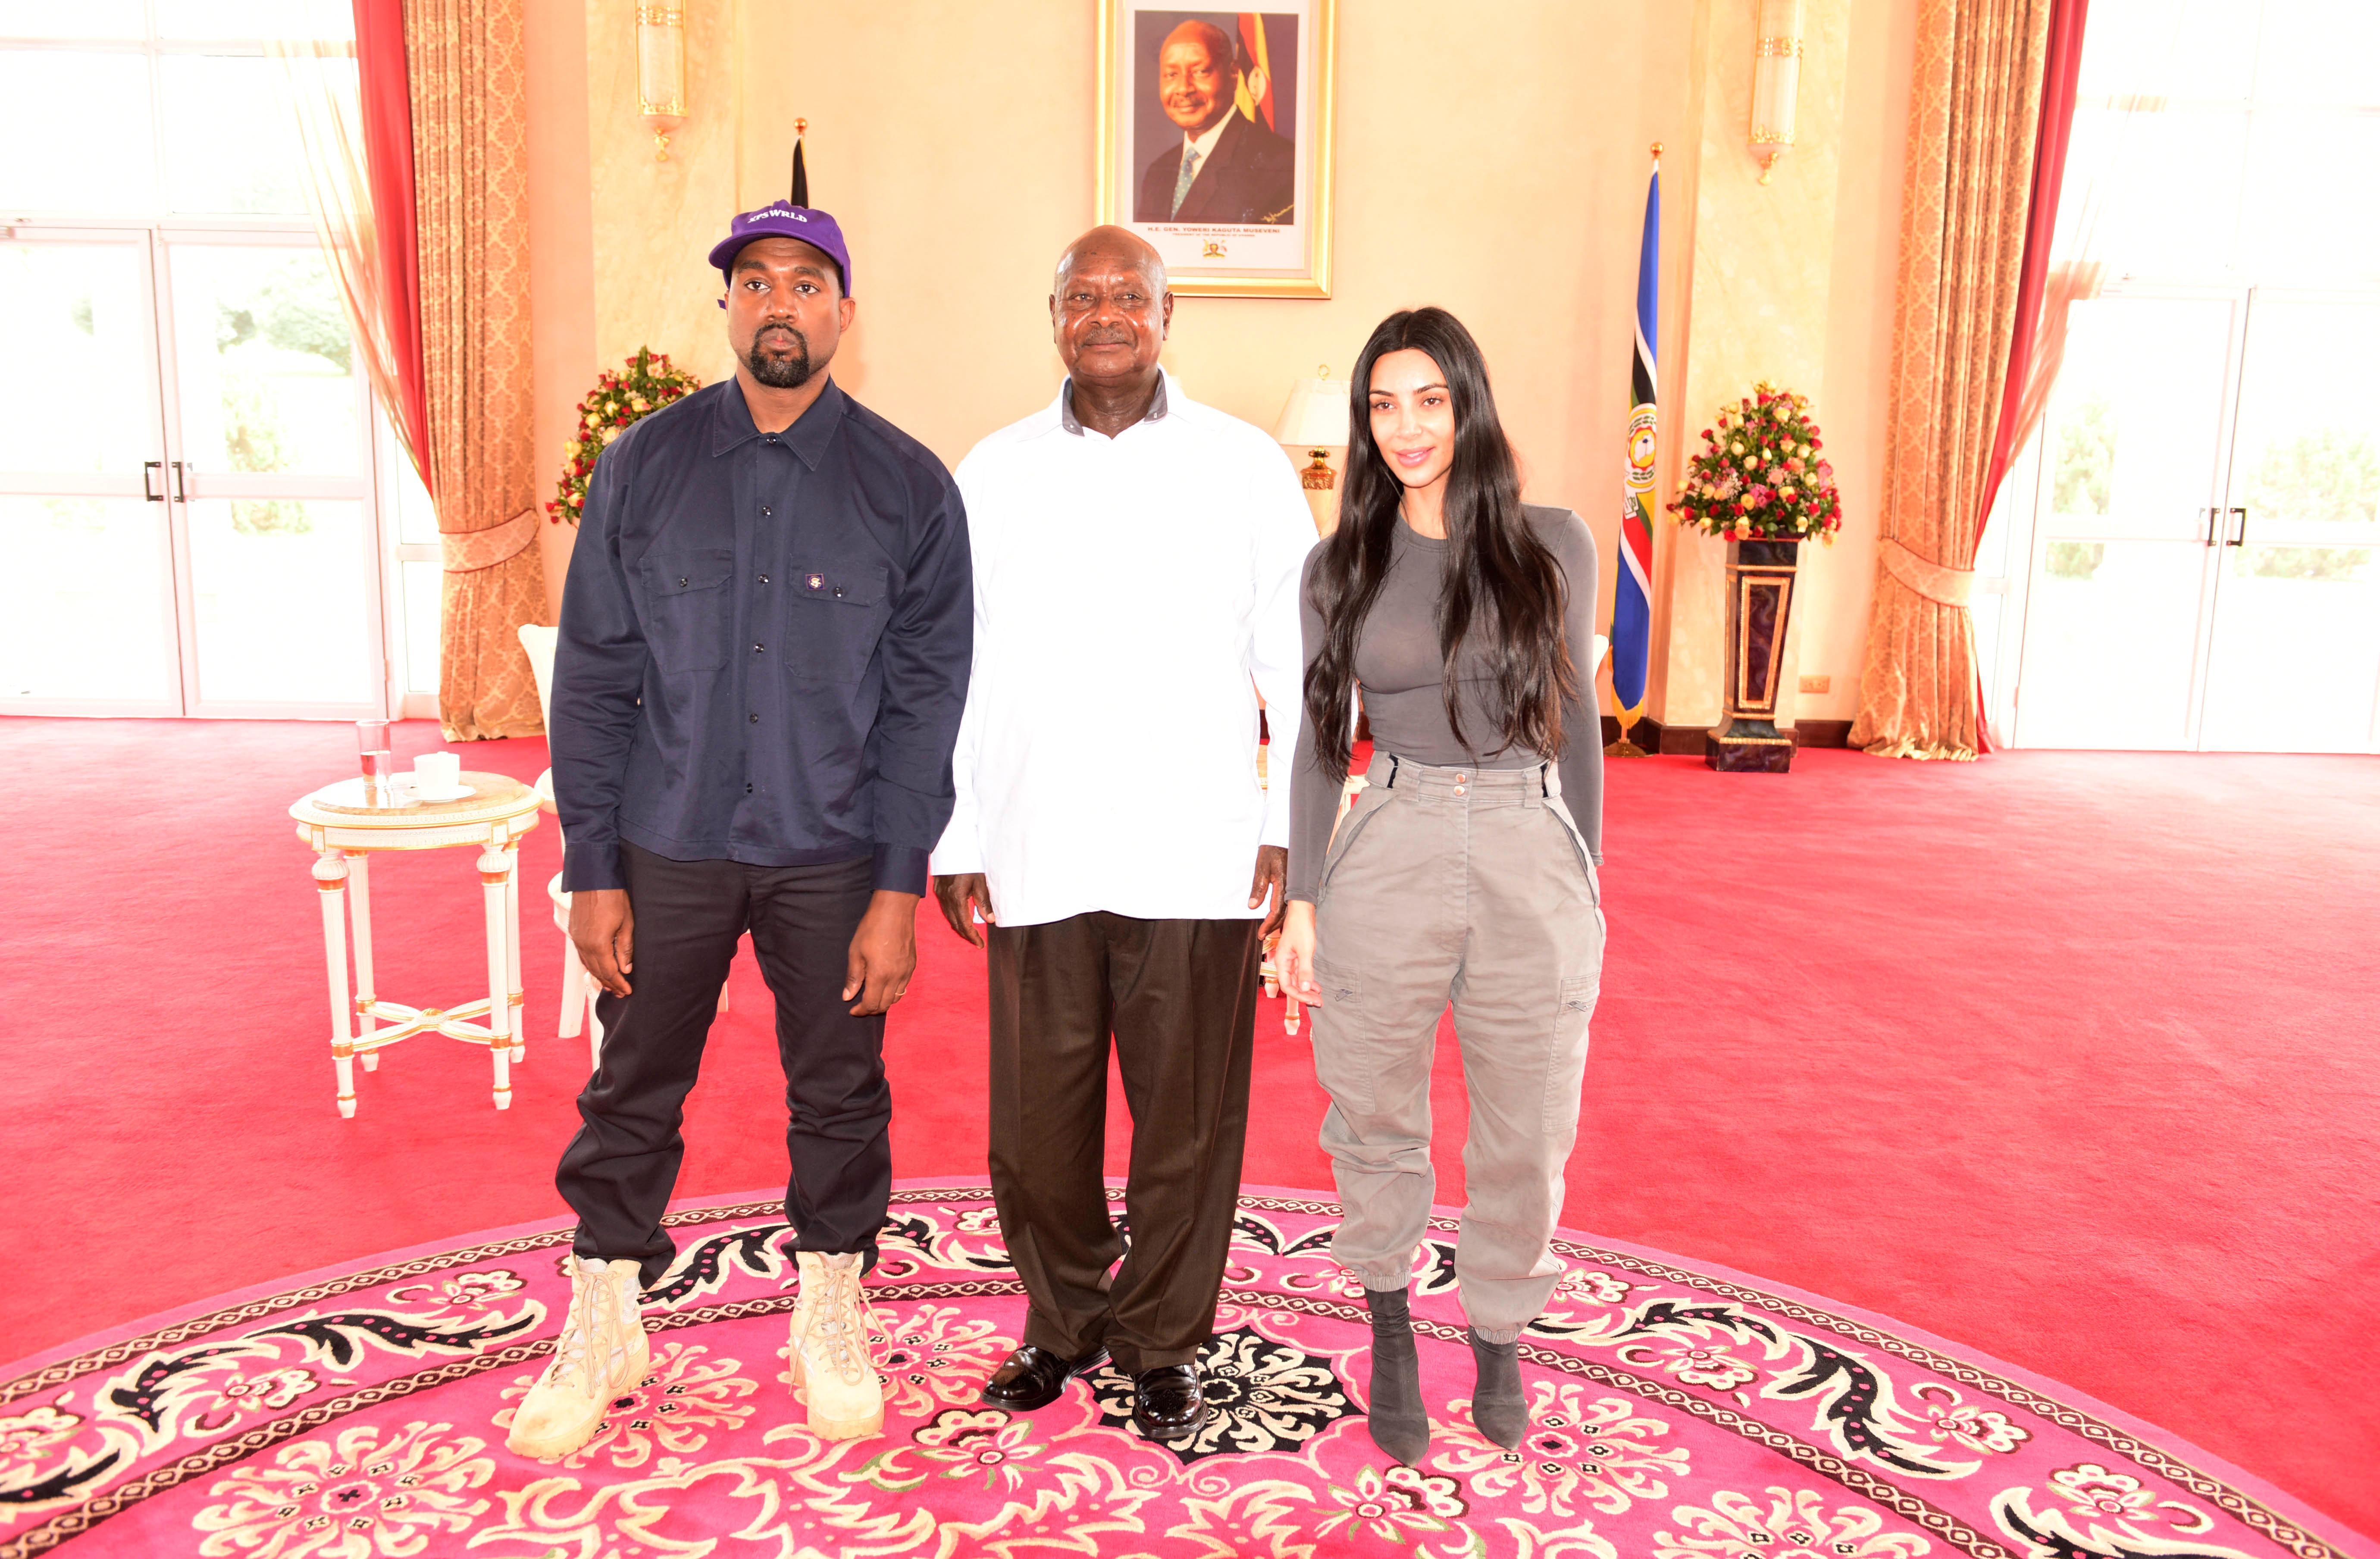 Kanye West, Kim Kardashian, Uganda Yoweri